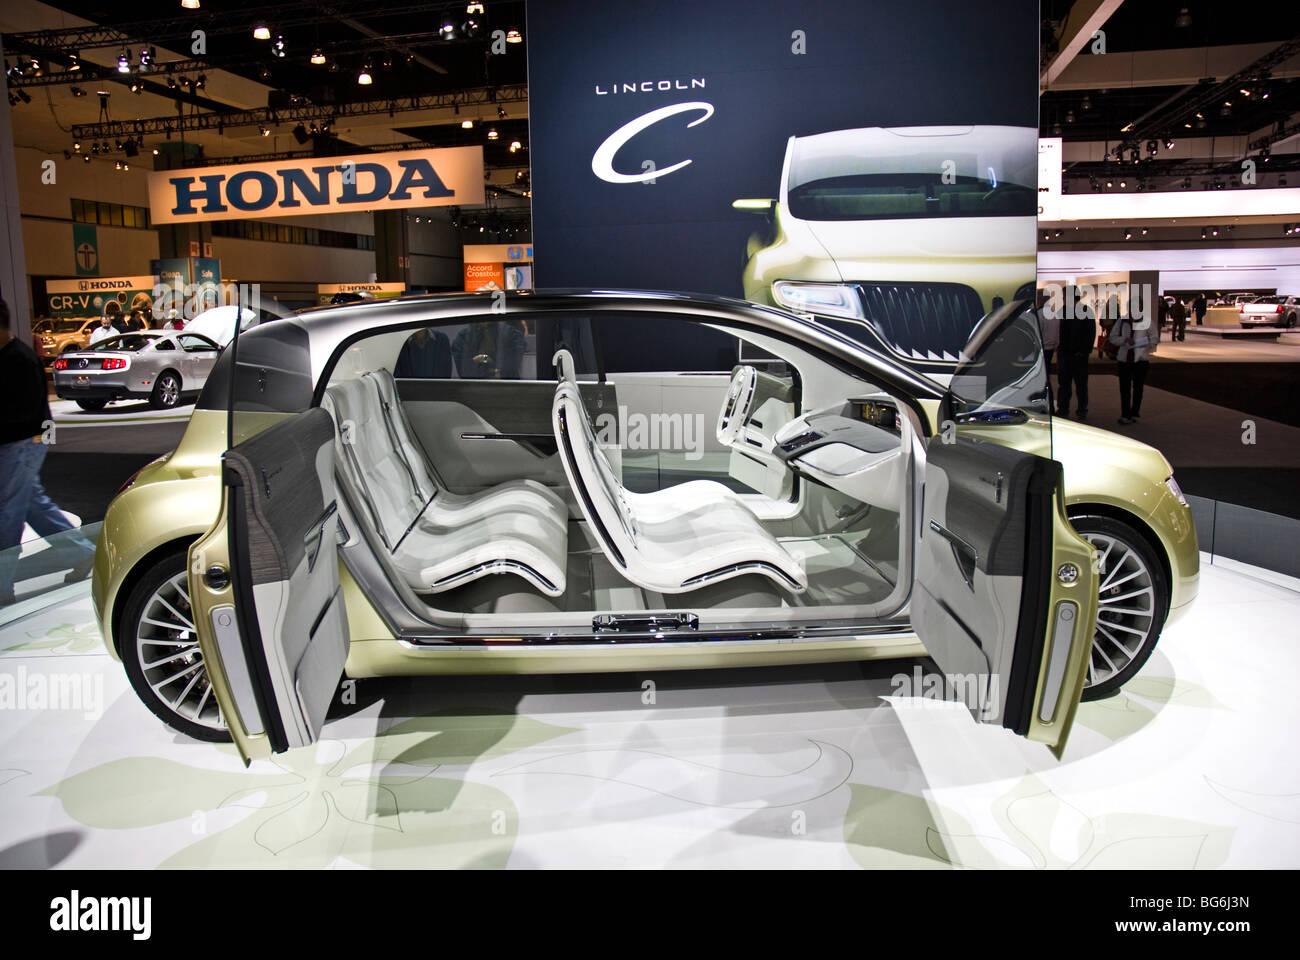 https://c8.alamy.com/comp/BG6J3N/the-lincoln-c-concept-car-at-the-2009-la-auto-show-in-the-los-angeles-BG6J3N.jpg